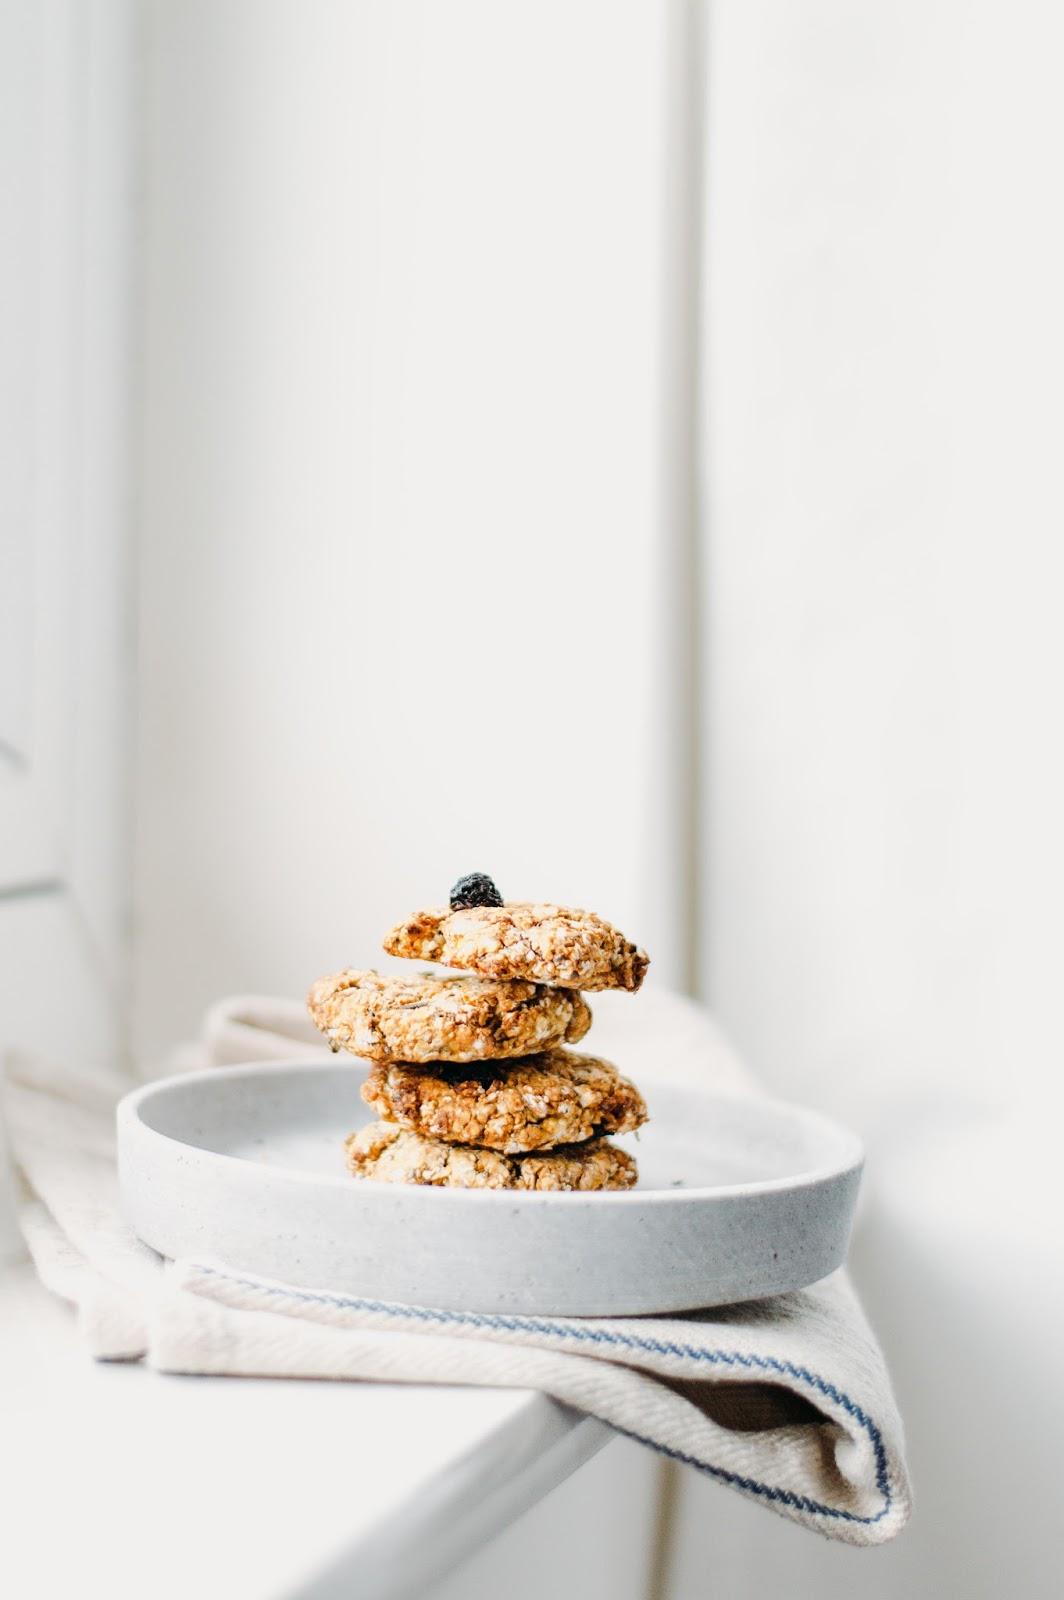 Orange and Cardamom Oat Cookies| https://oandrajos.blogspot.com